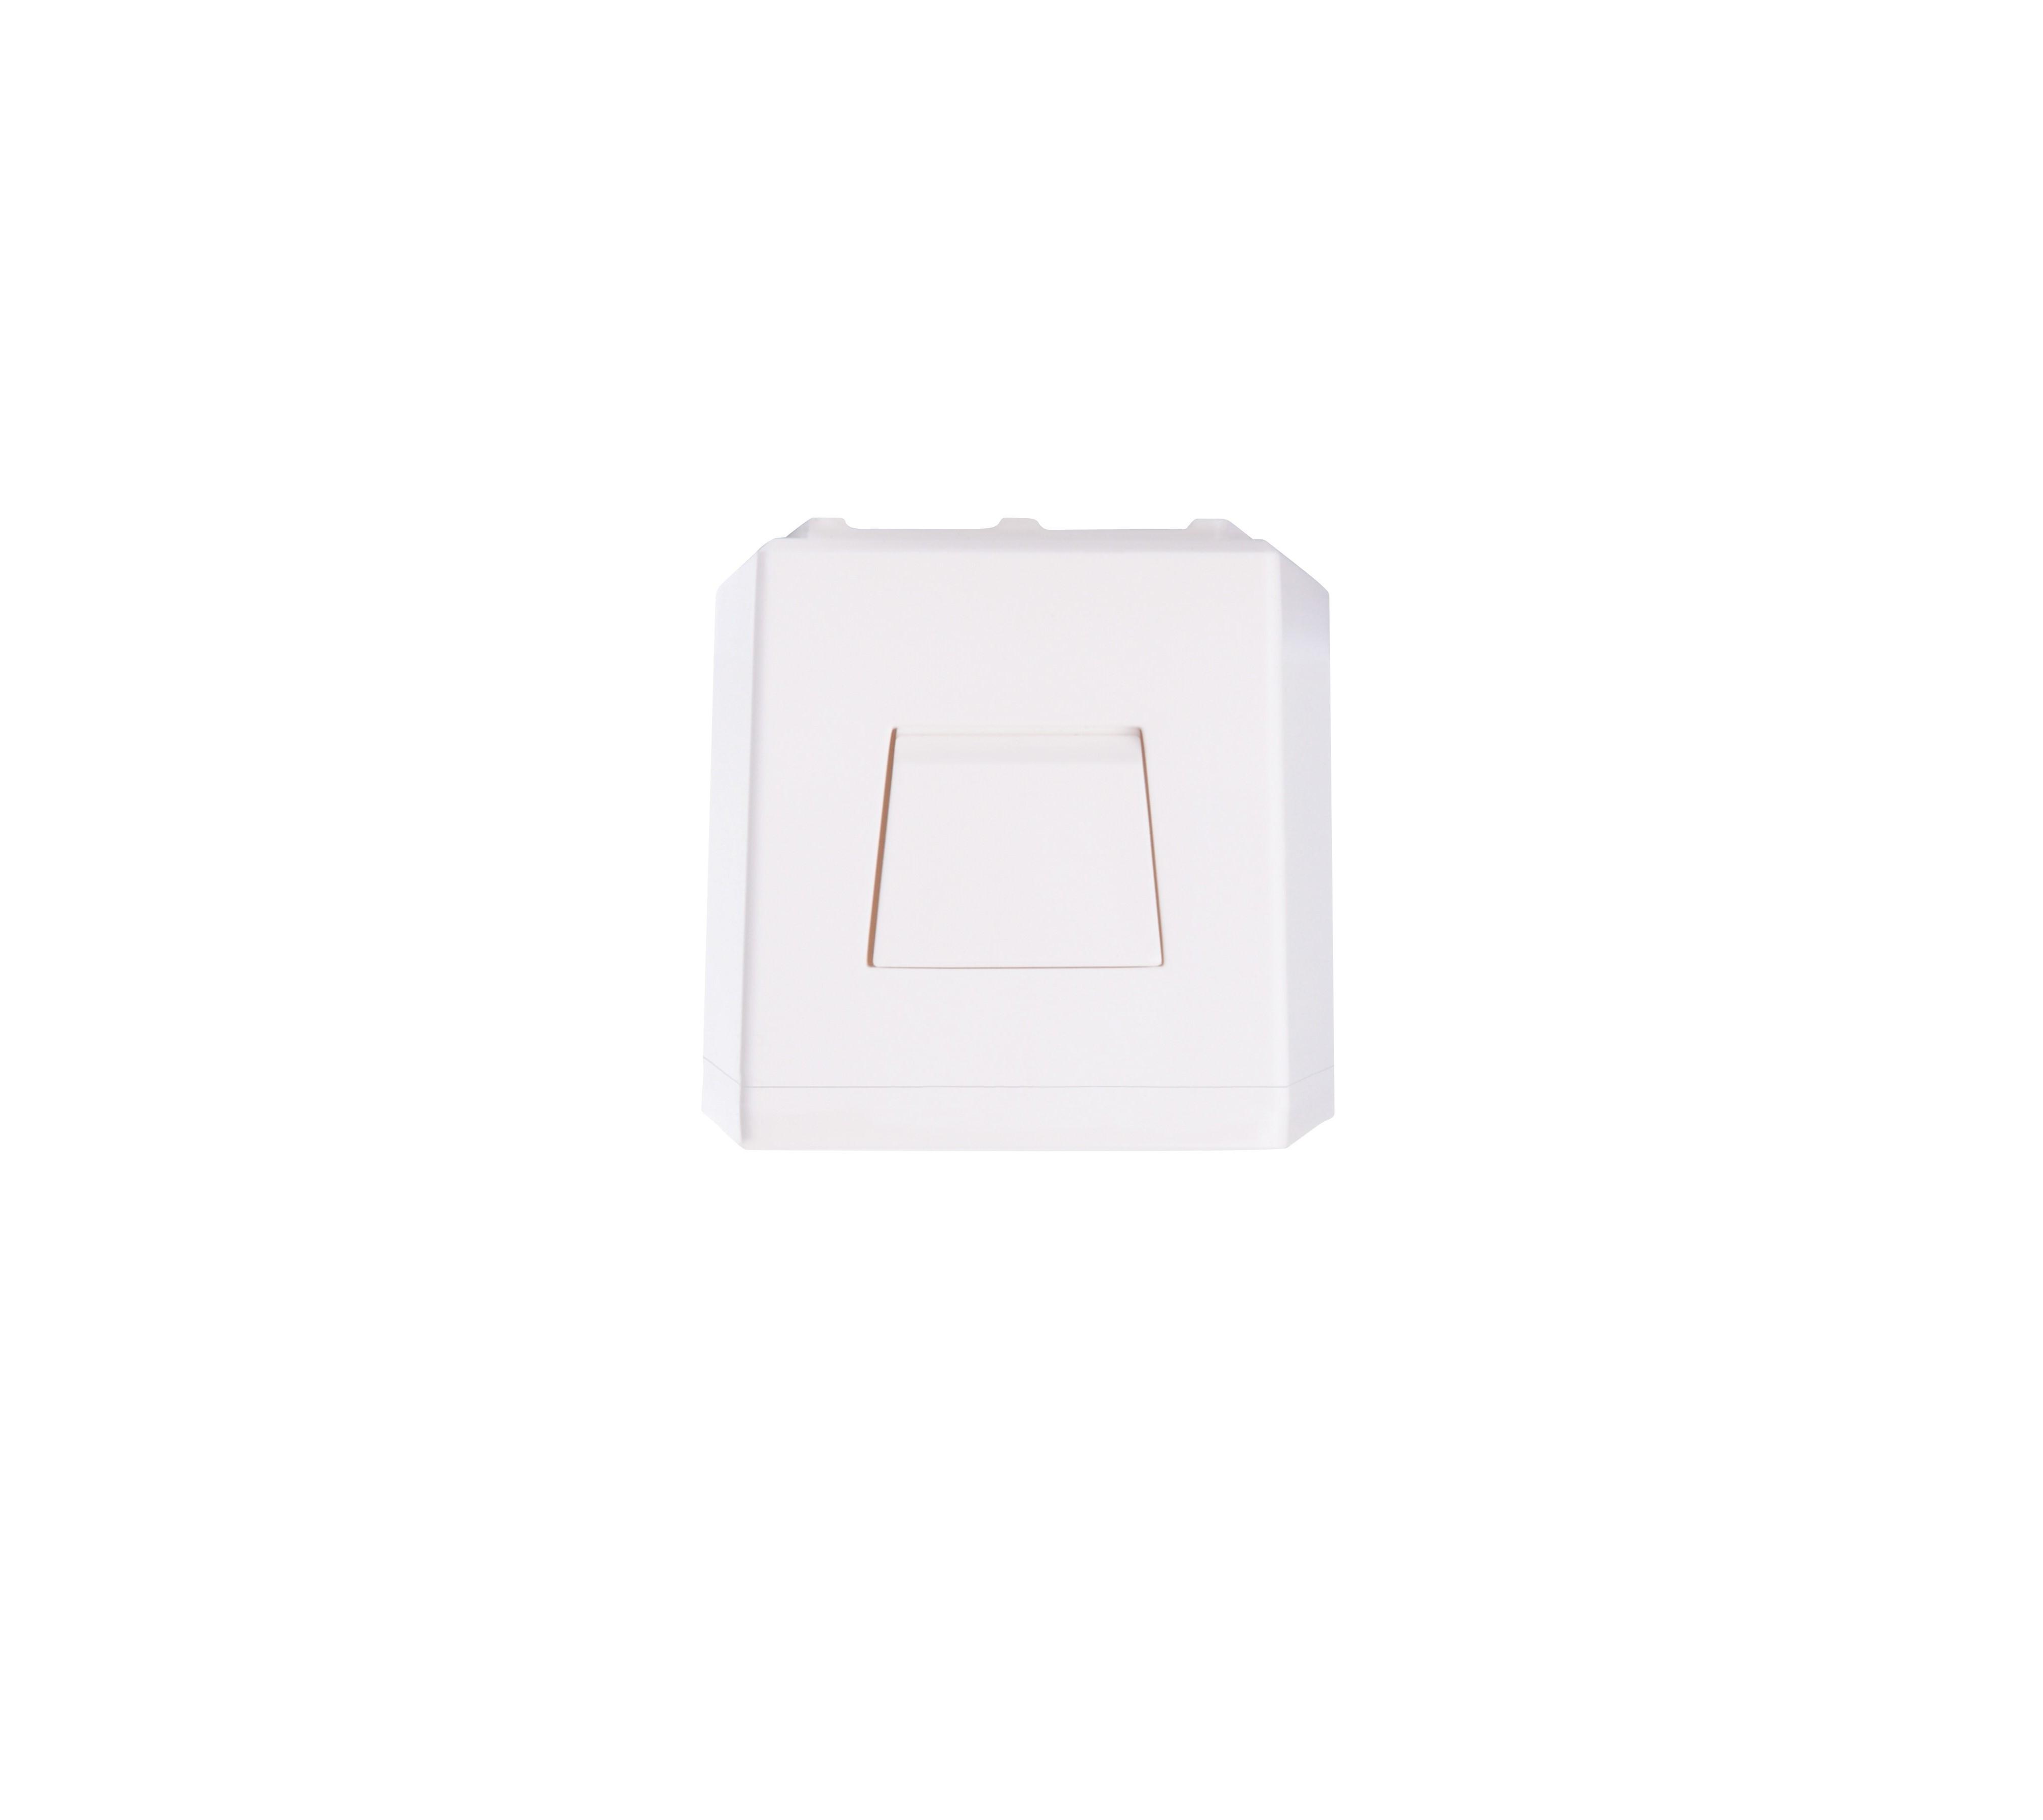 Lampa emergenta led Intelight 94719   3h nementinut test automat 1